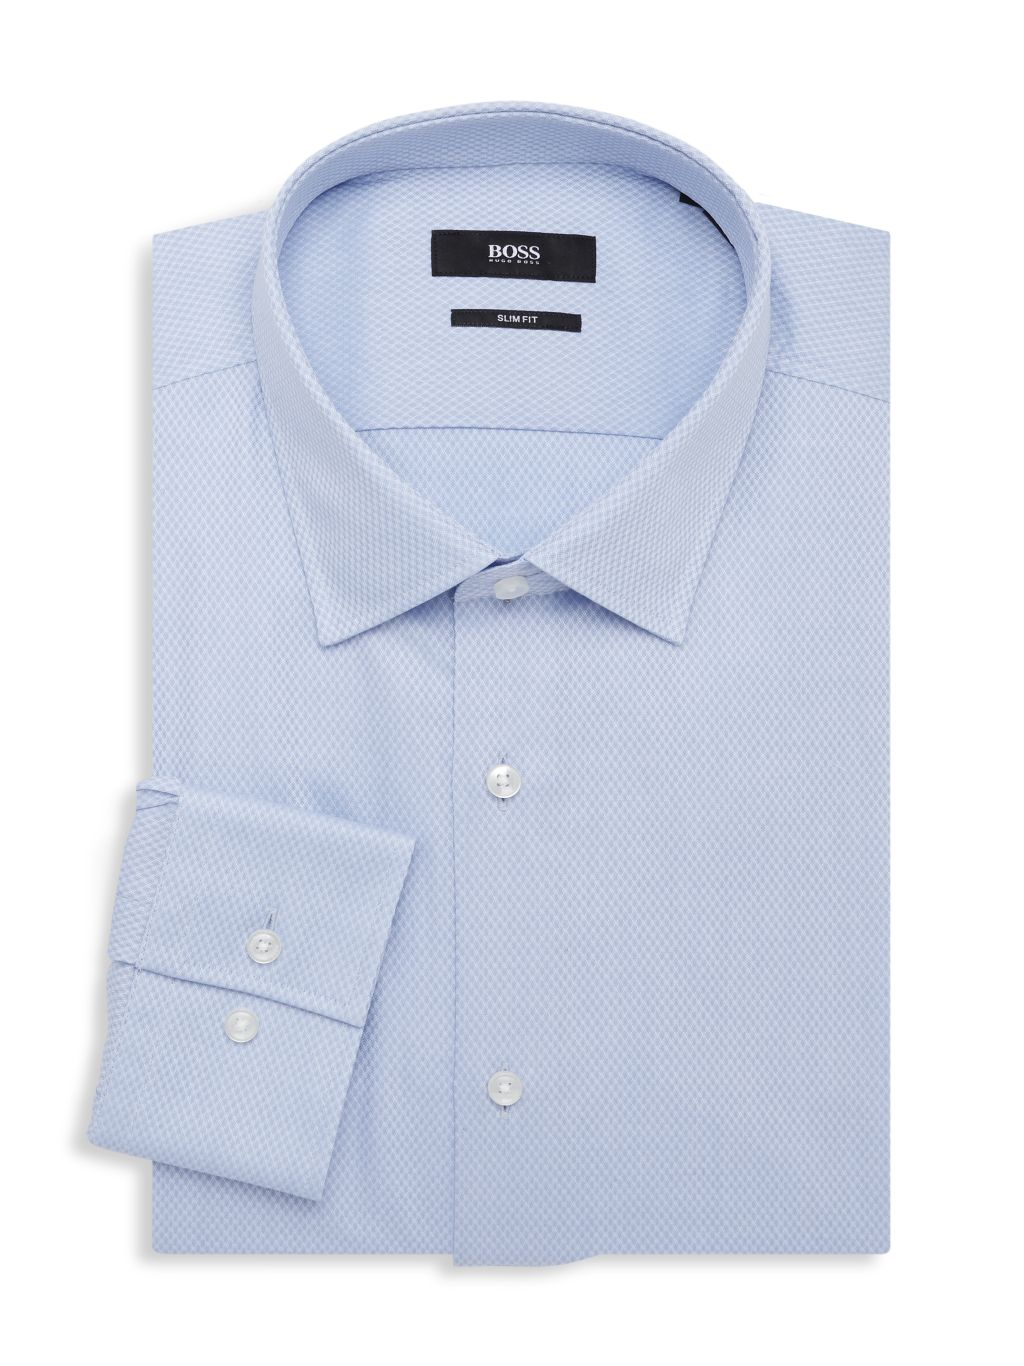 Boss Hugo Boss Jenno Slim-Fit Textured Dress Shirt